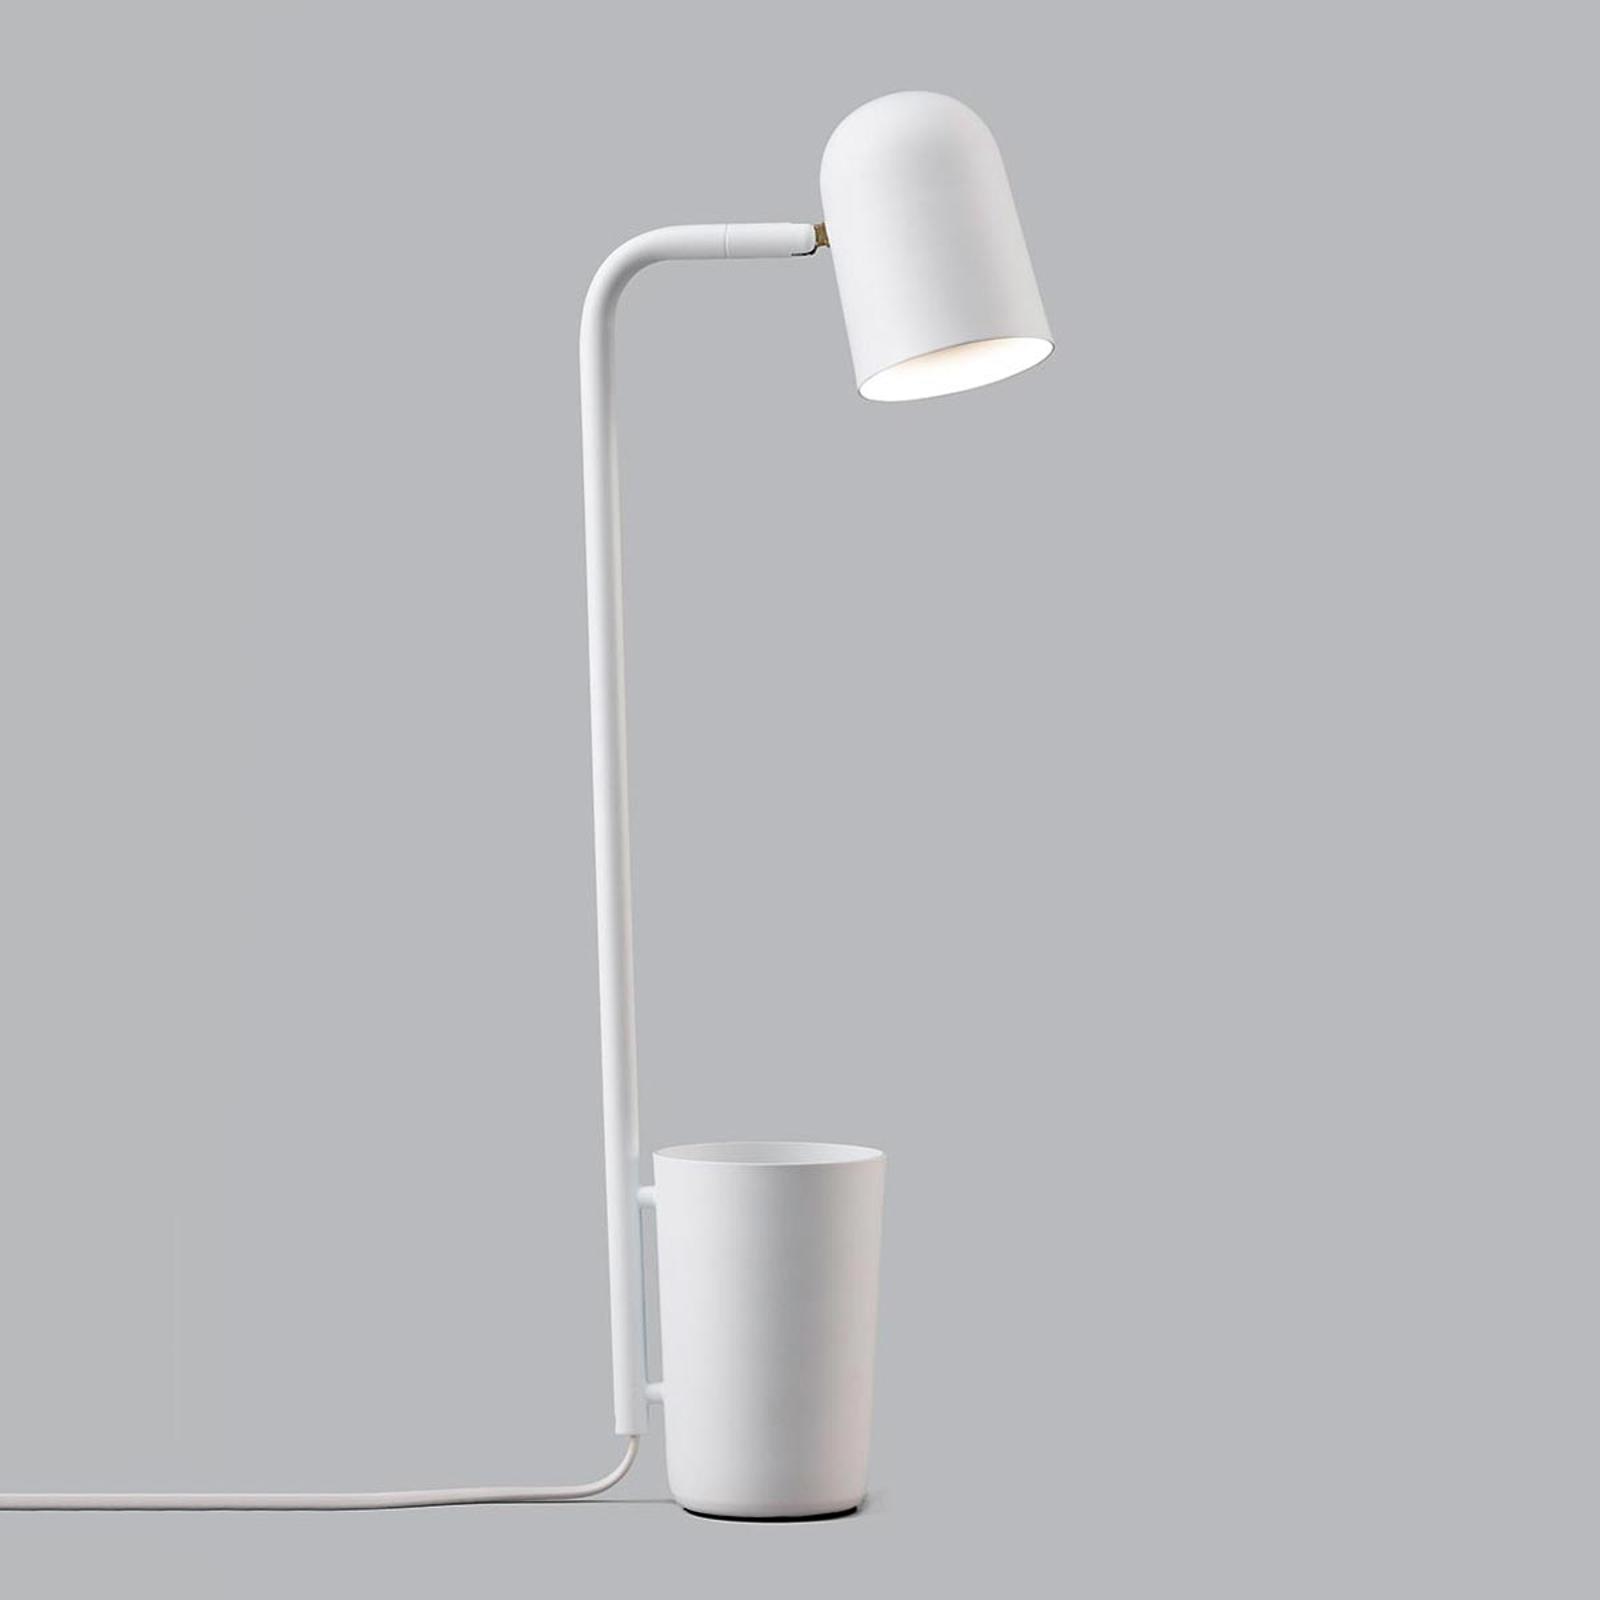 Northern Buddy - Bureaulamp, wit